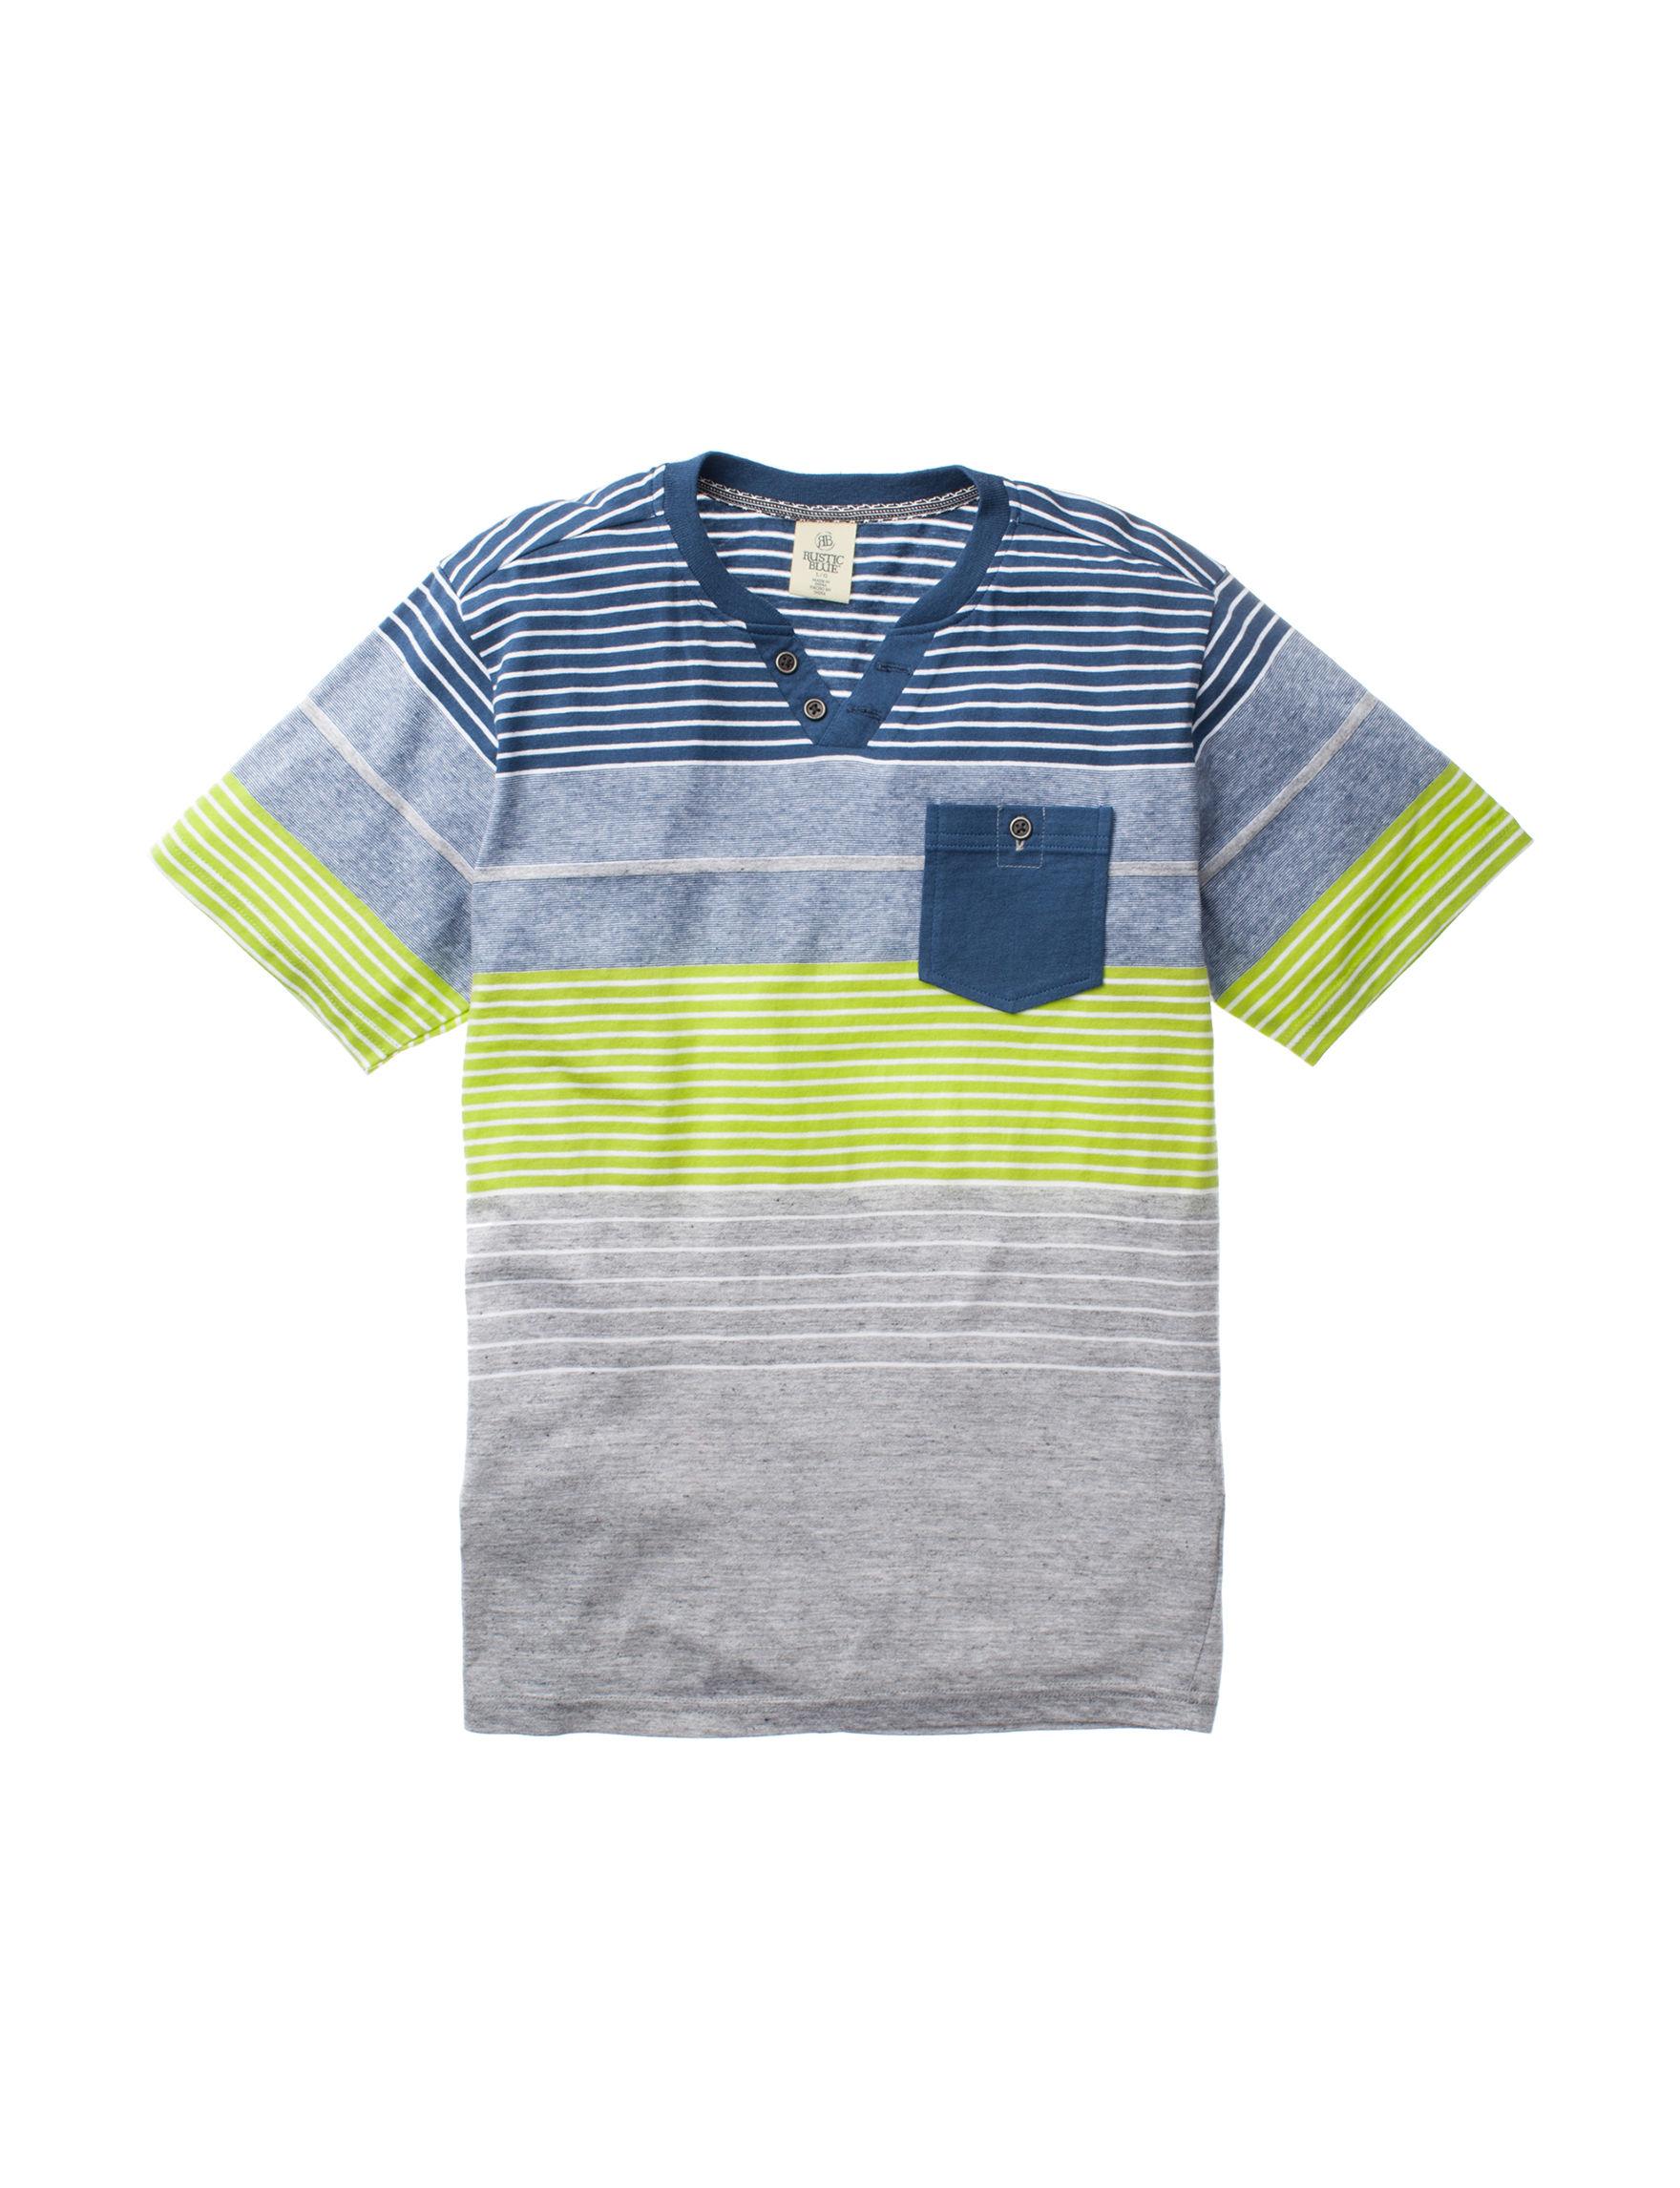 Rustic Blue Blue Stripe Tees & Tanks